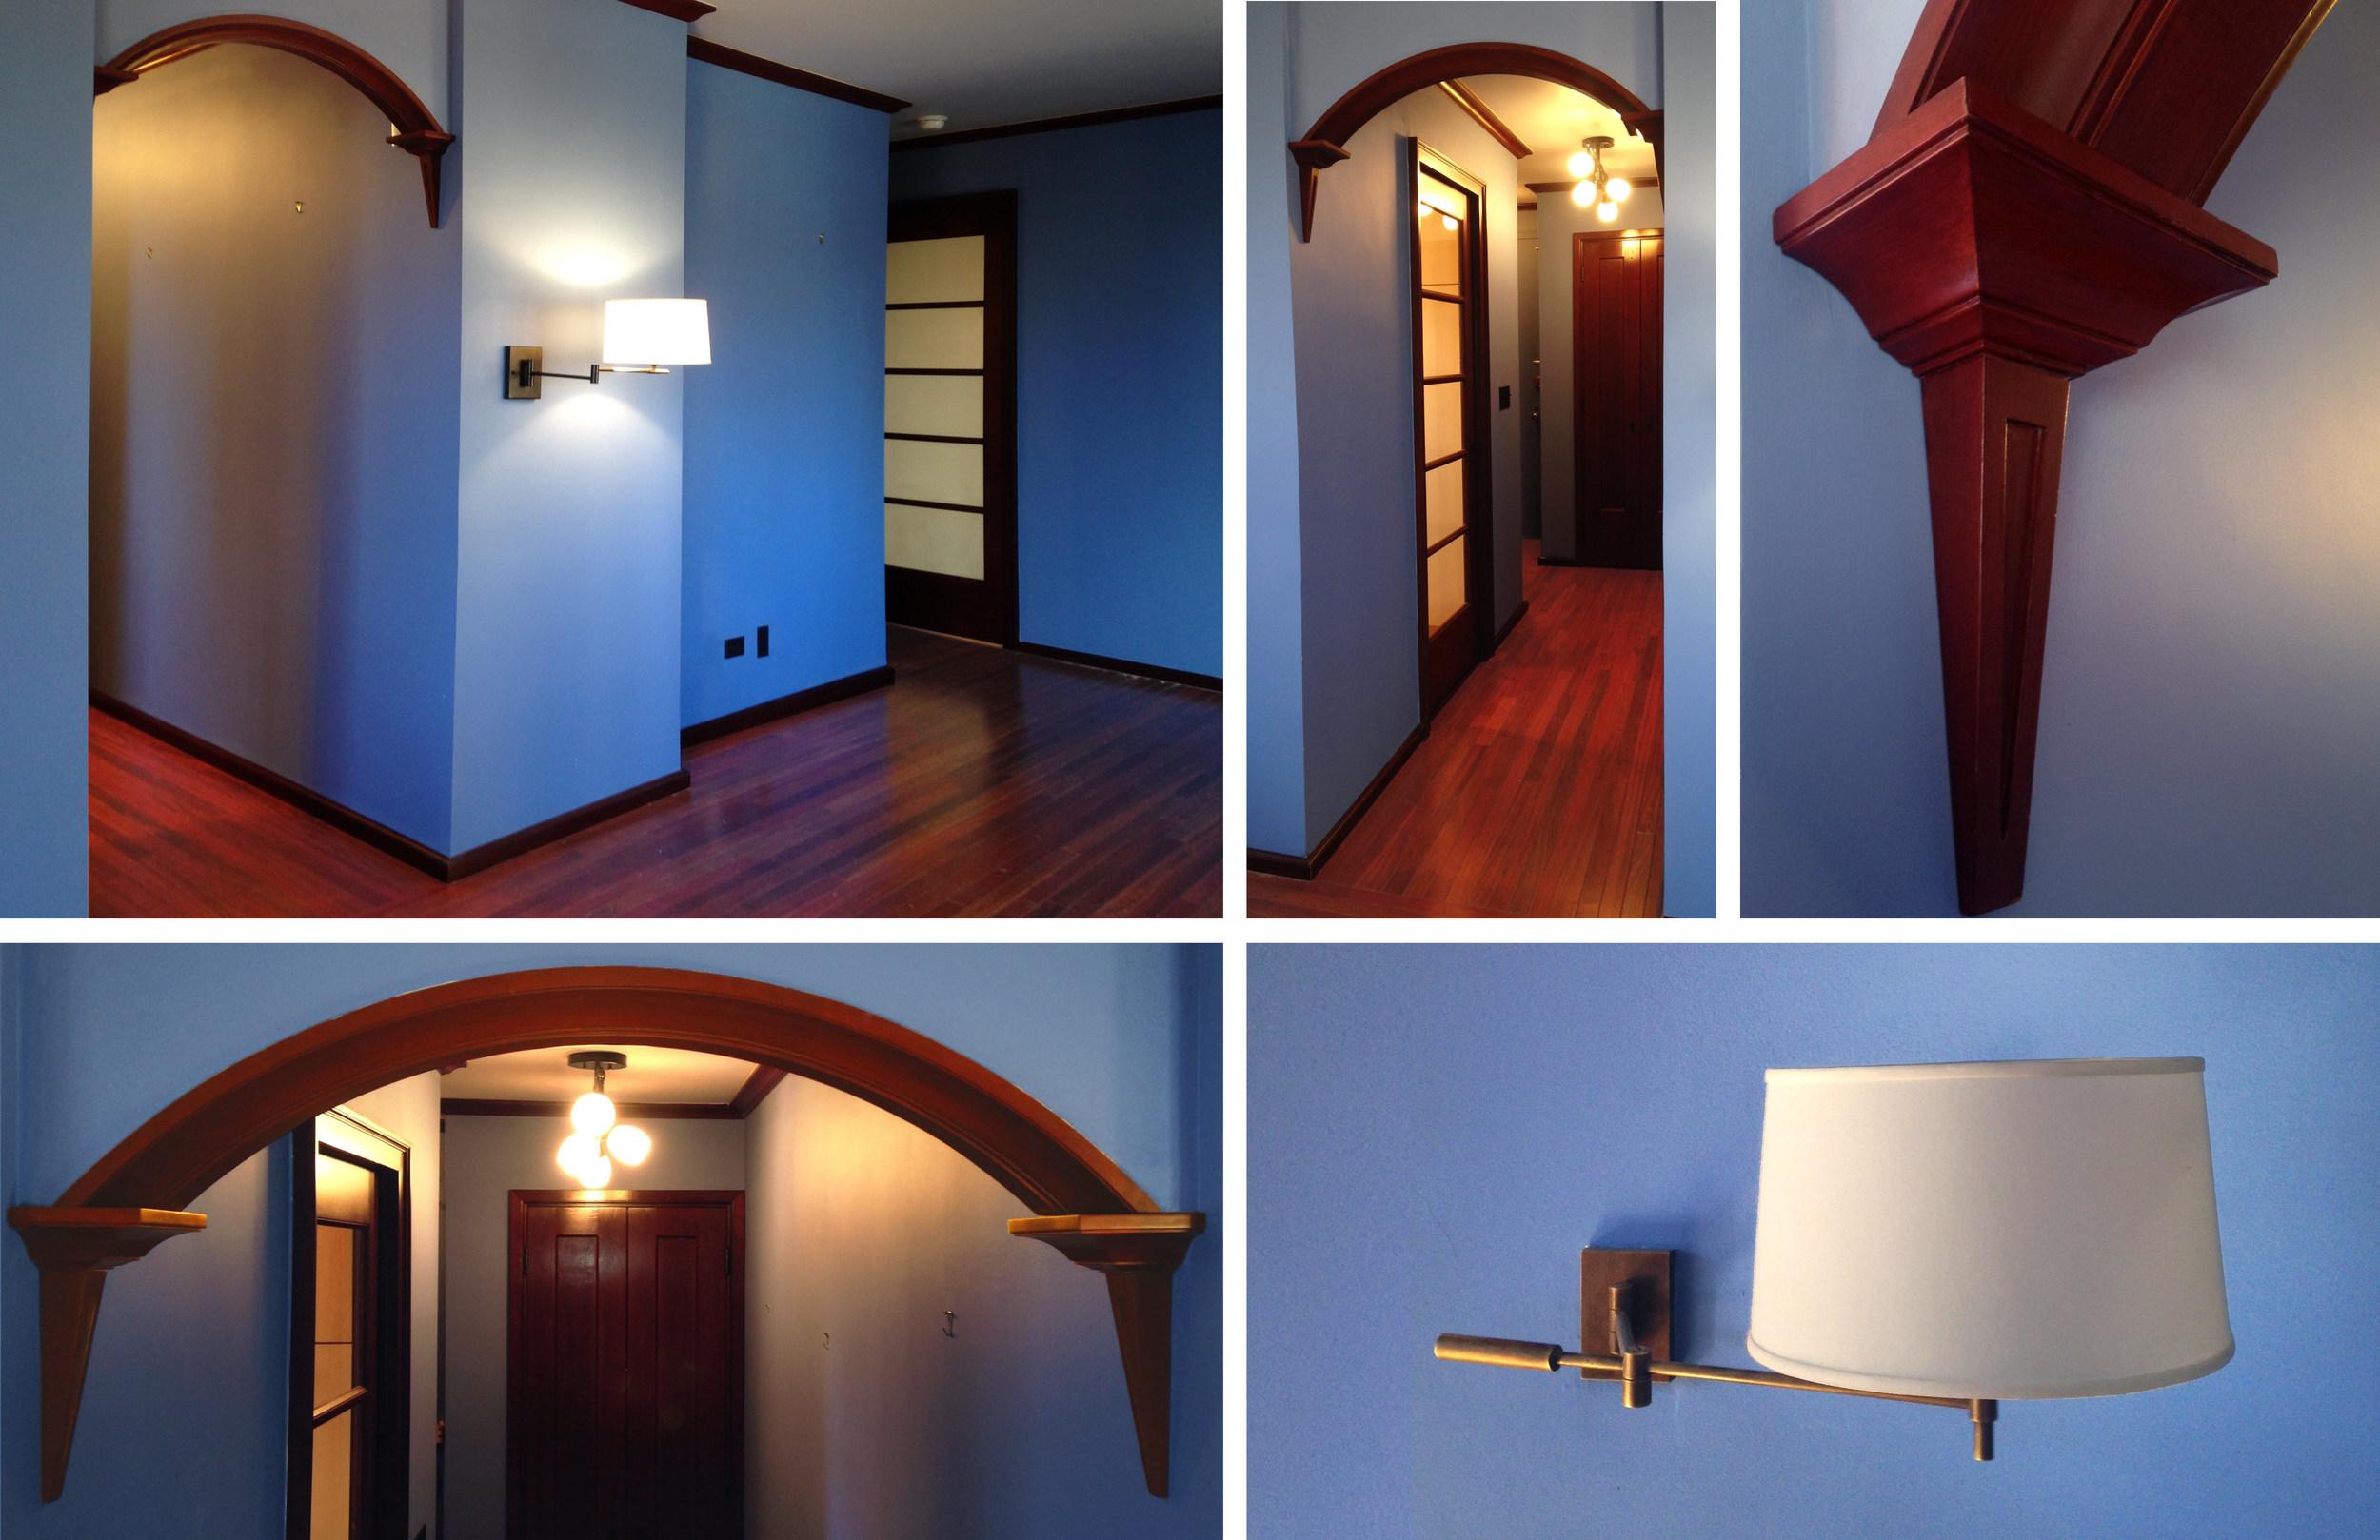 INTERIOR ARCHITECTURE, KITCHEN & BATHROOM DESIGN: ONE BEDROOM